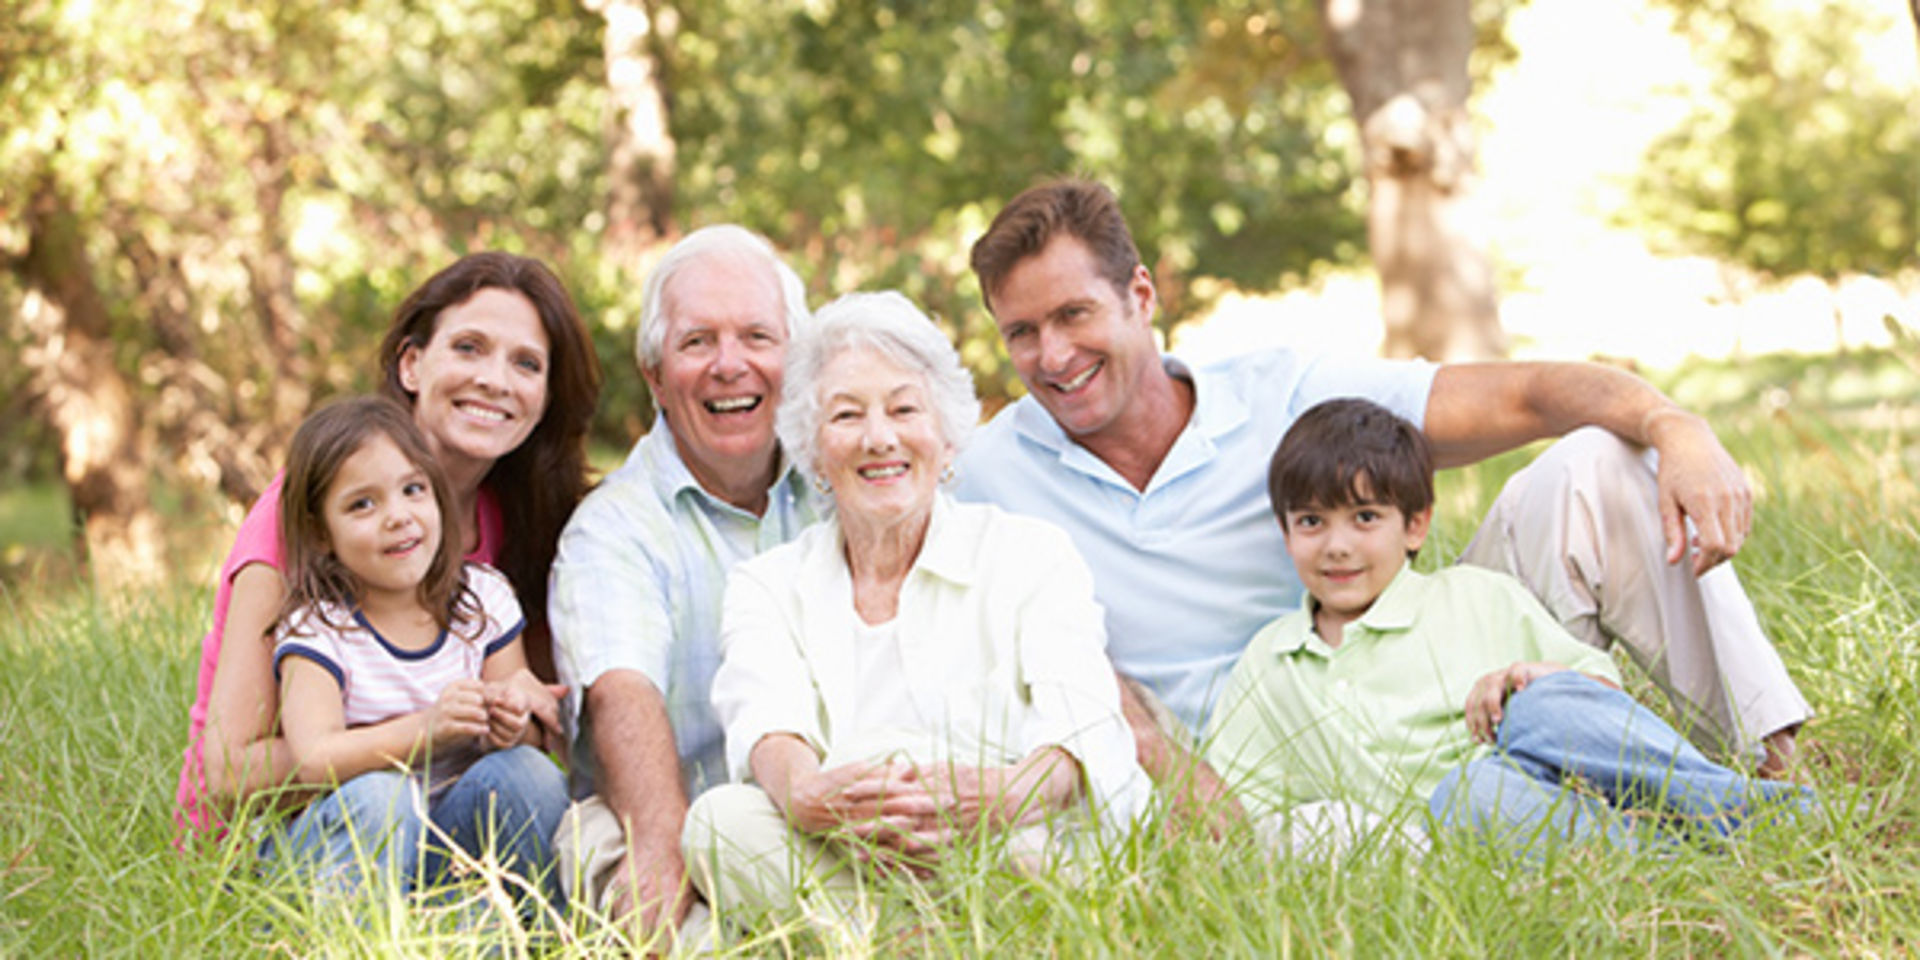 Gen Xers Driving Multi-Generational Housing Trend